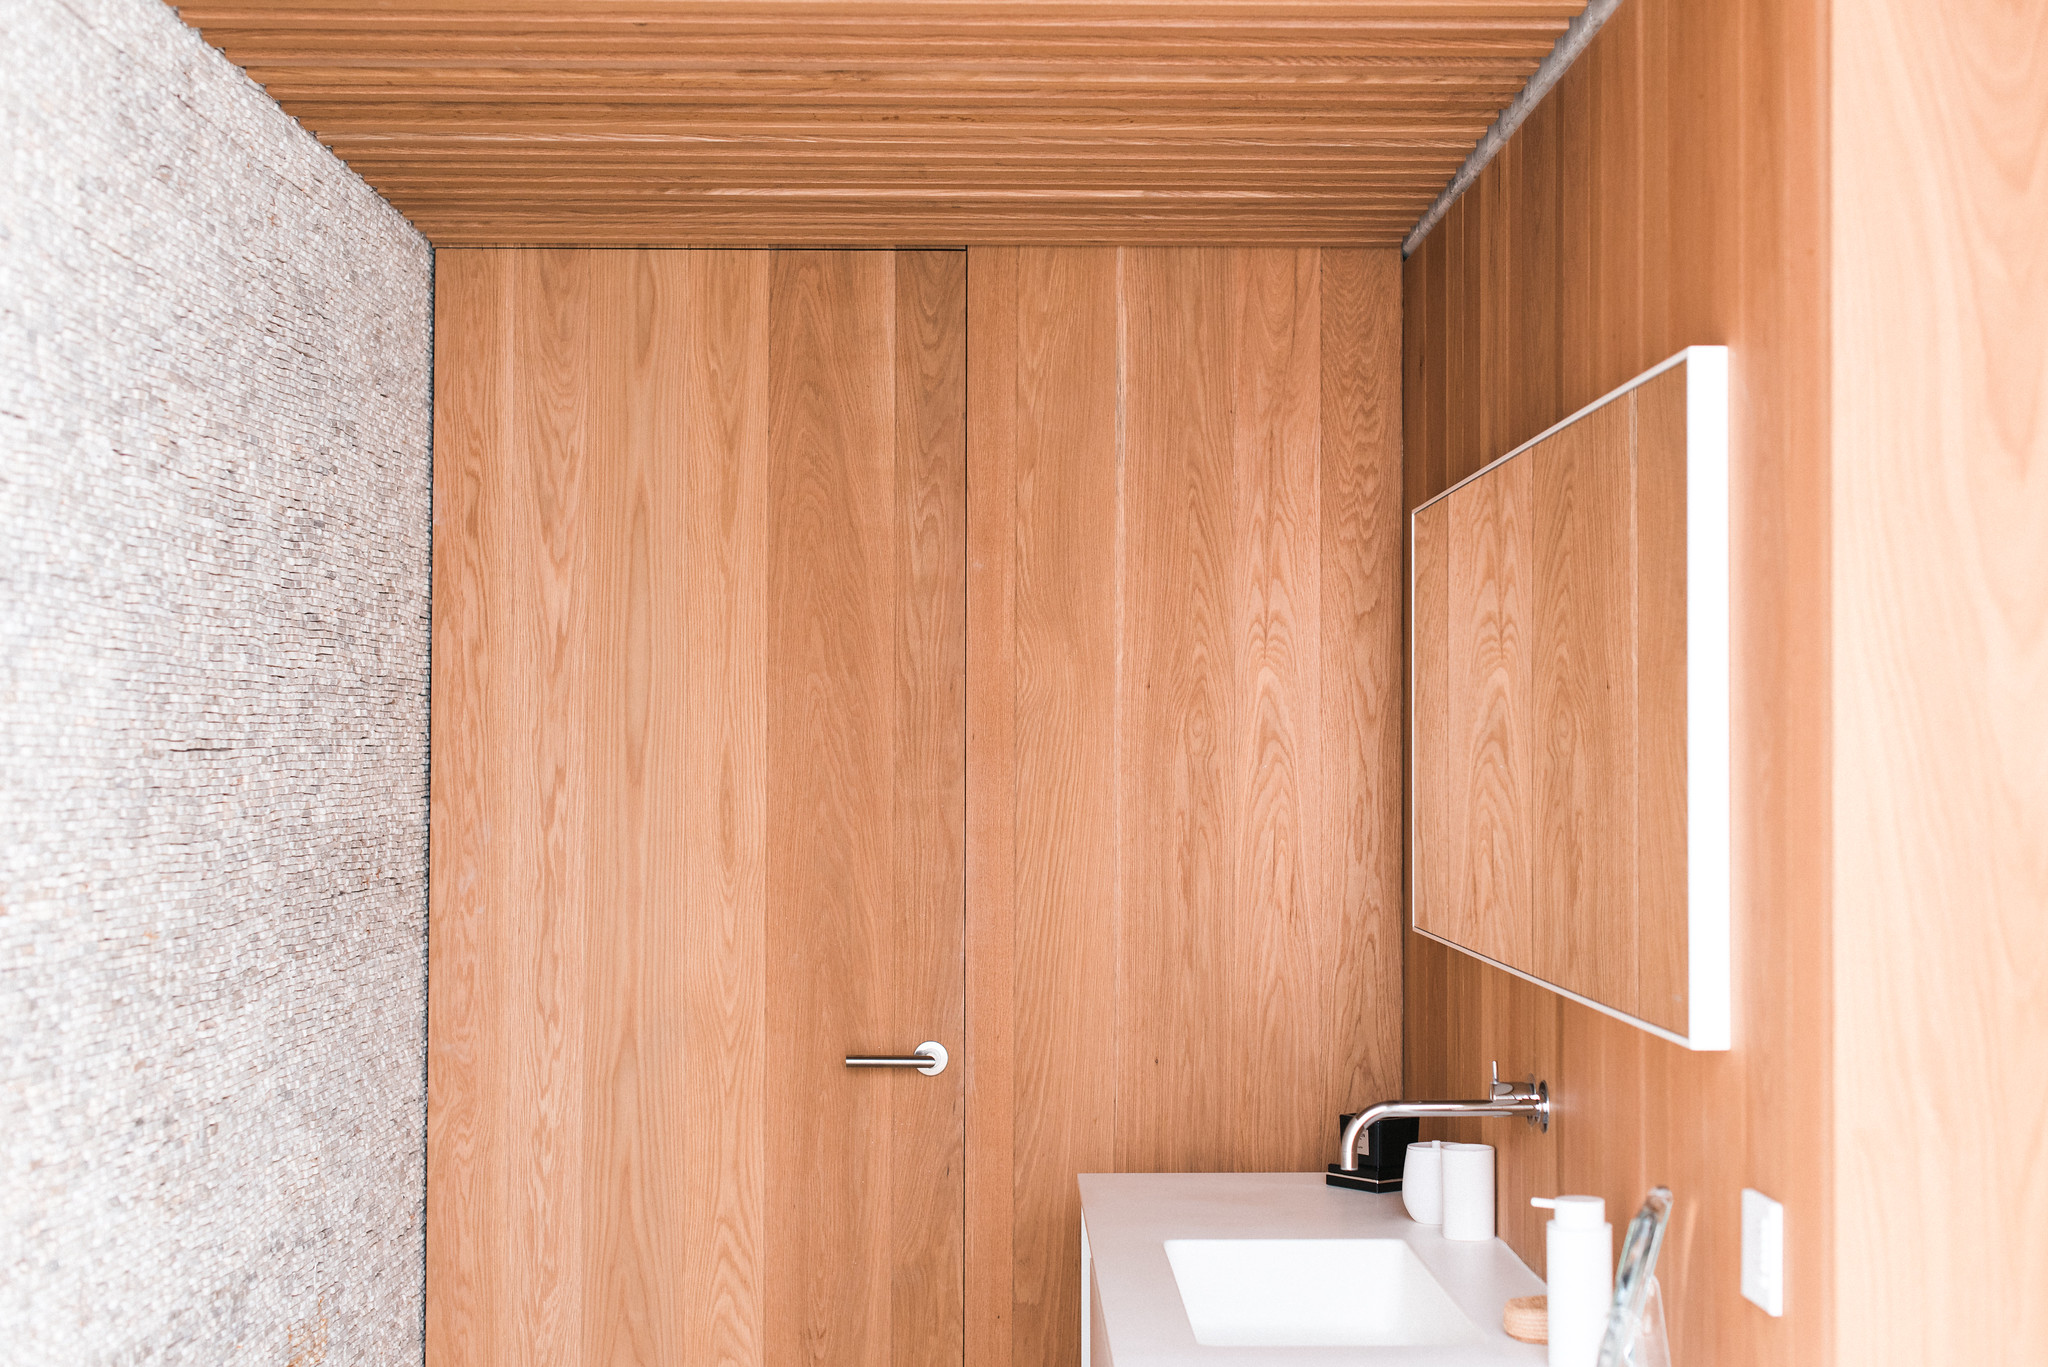 https://www.white-ibiza.com/wp-content/uploads/2020/06/white-ibiza-villas-casa-valentina-interior-bathroom2.jpg